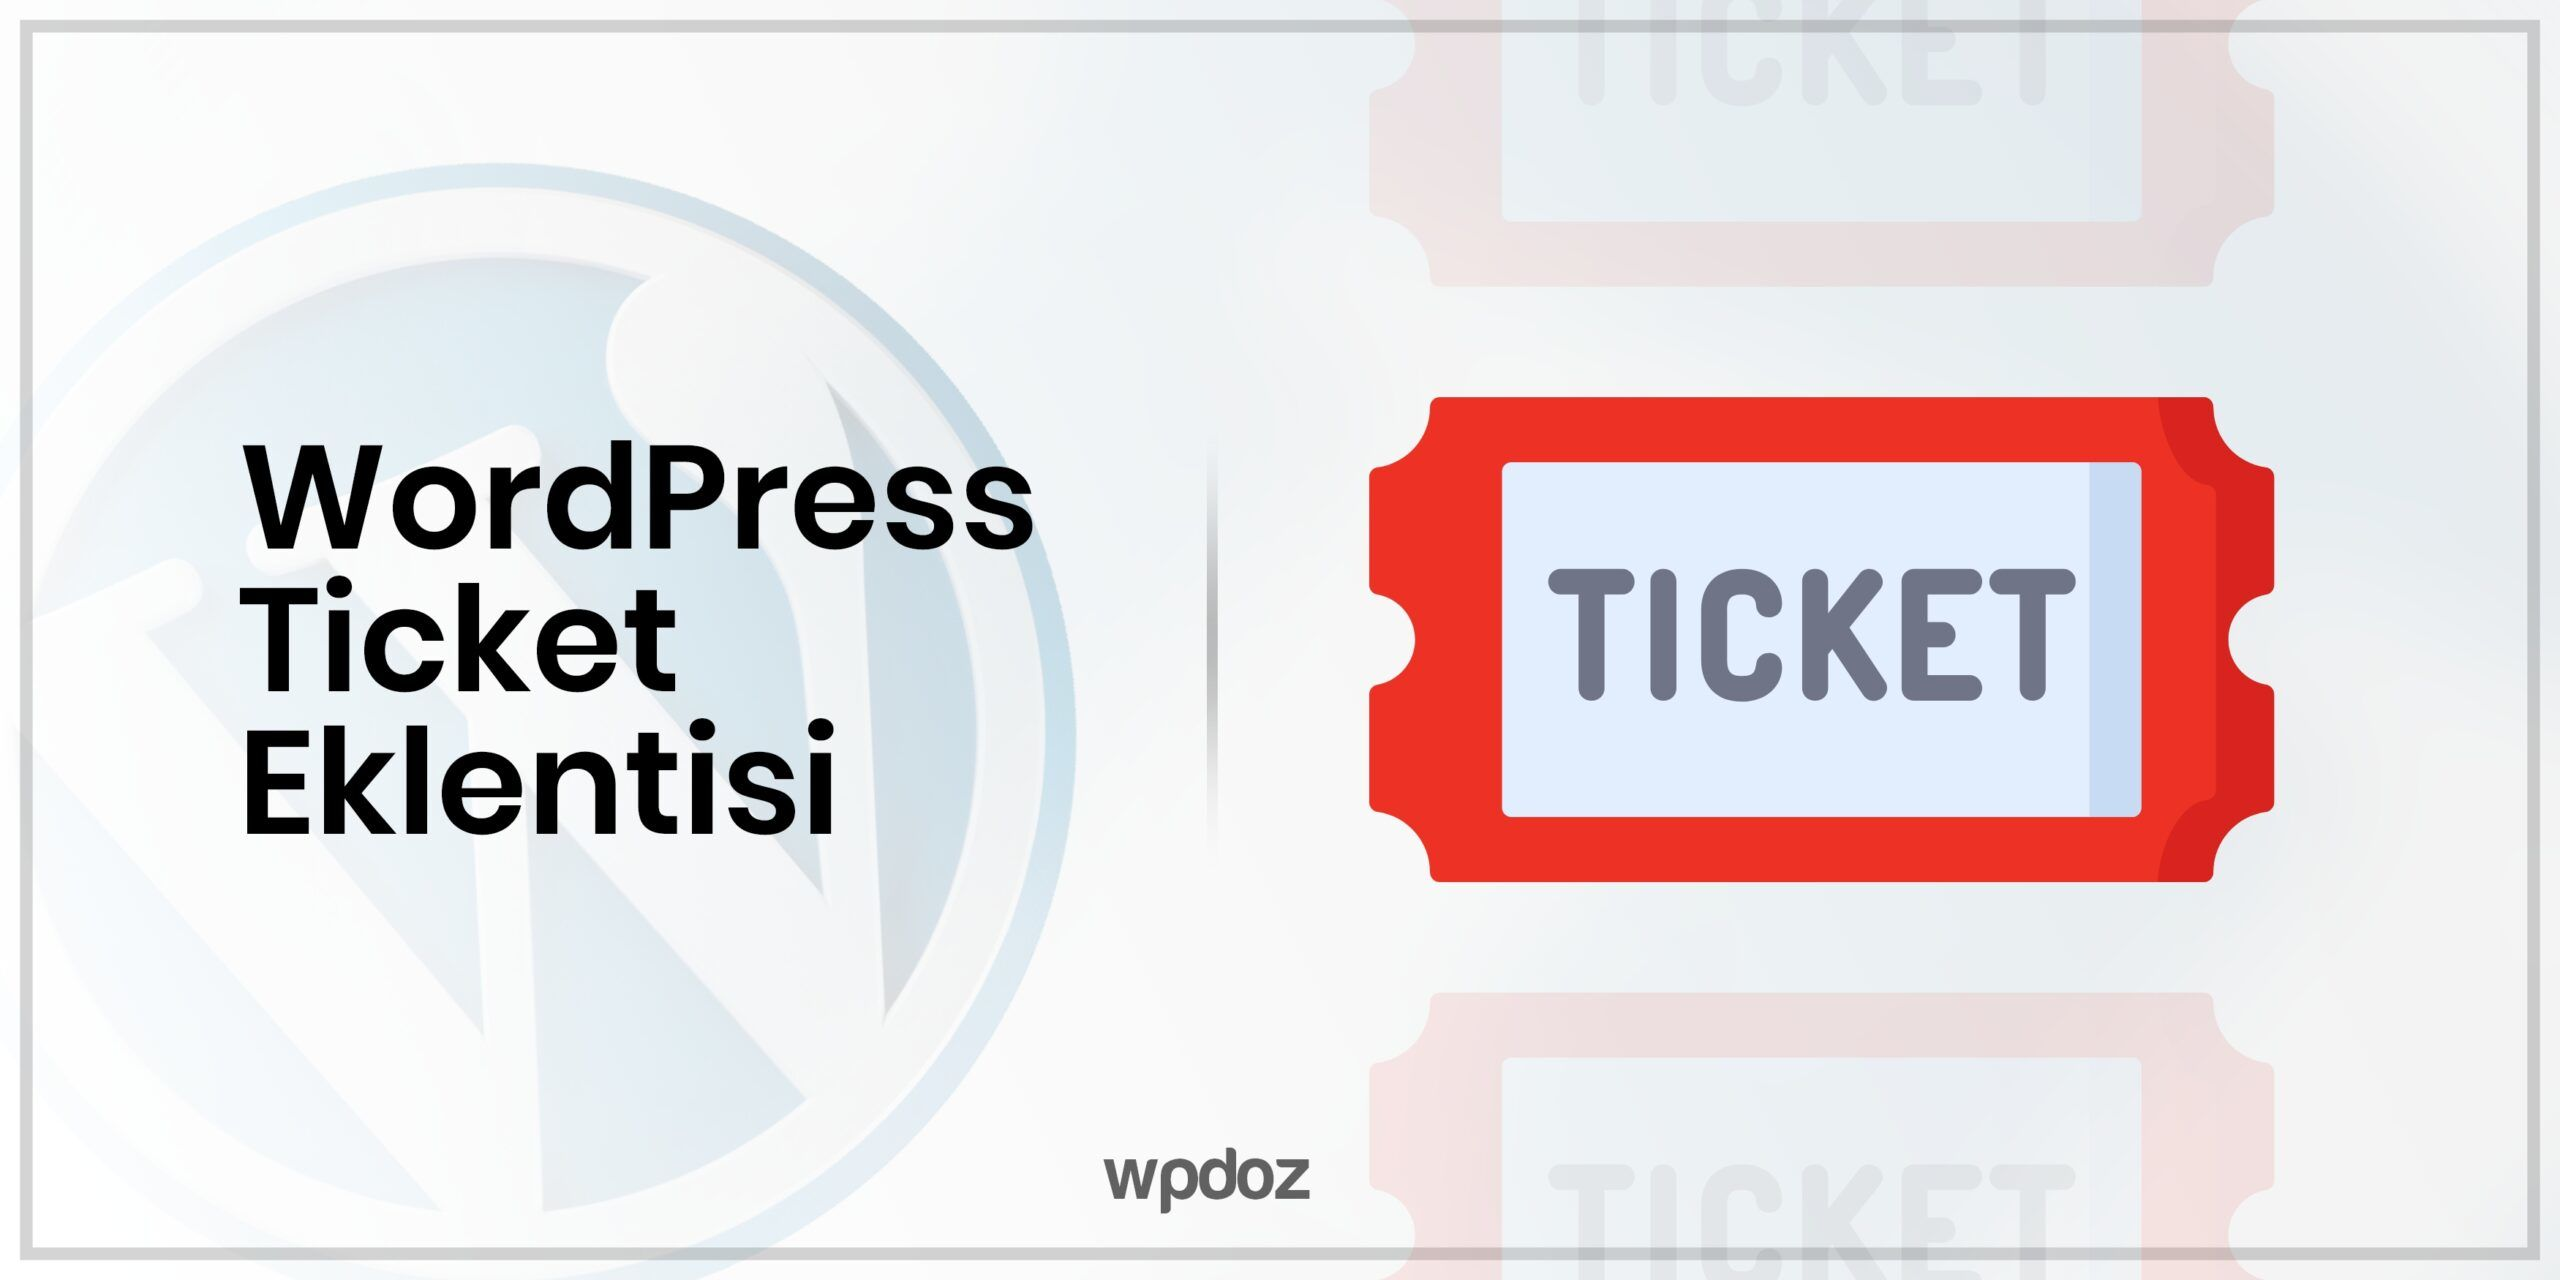 WordPress Ticket Eklentisi (Destek Eklentisi)- 7 Farklı Eklenti